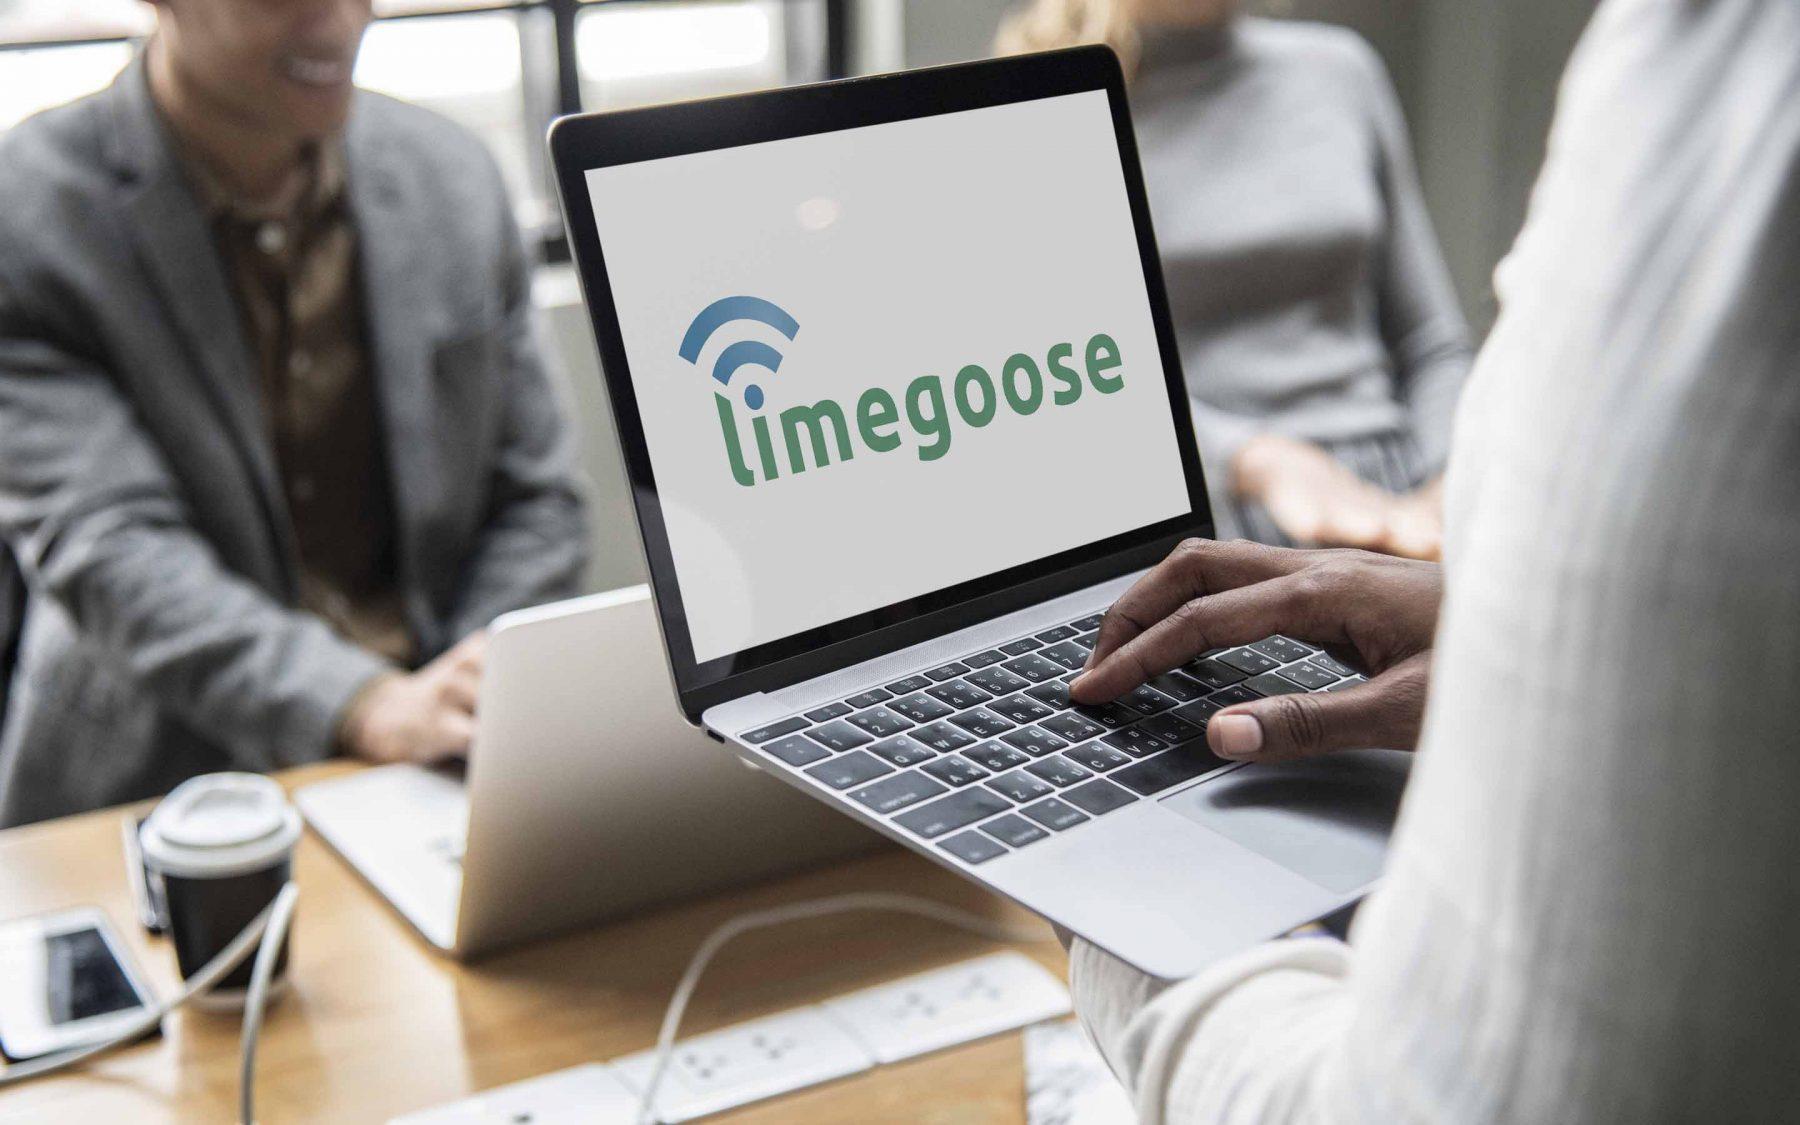 Limegoose 2